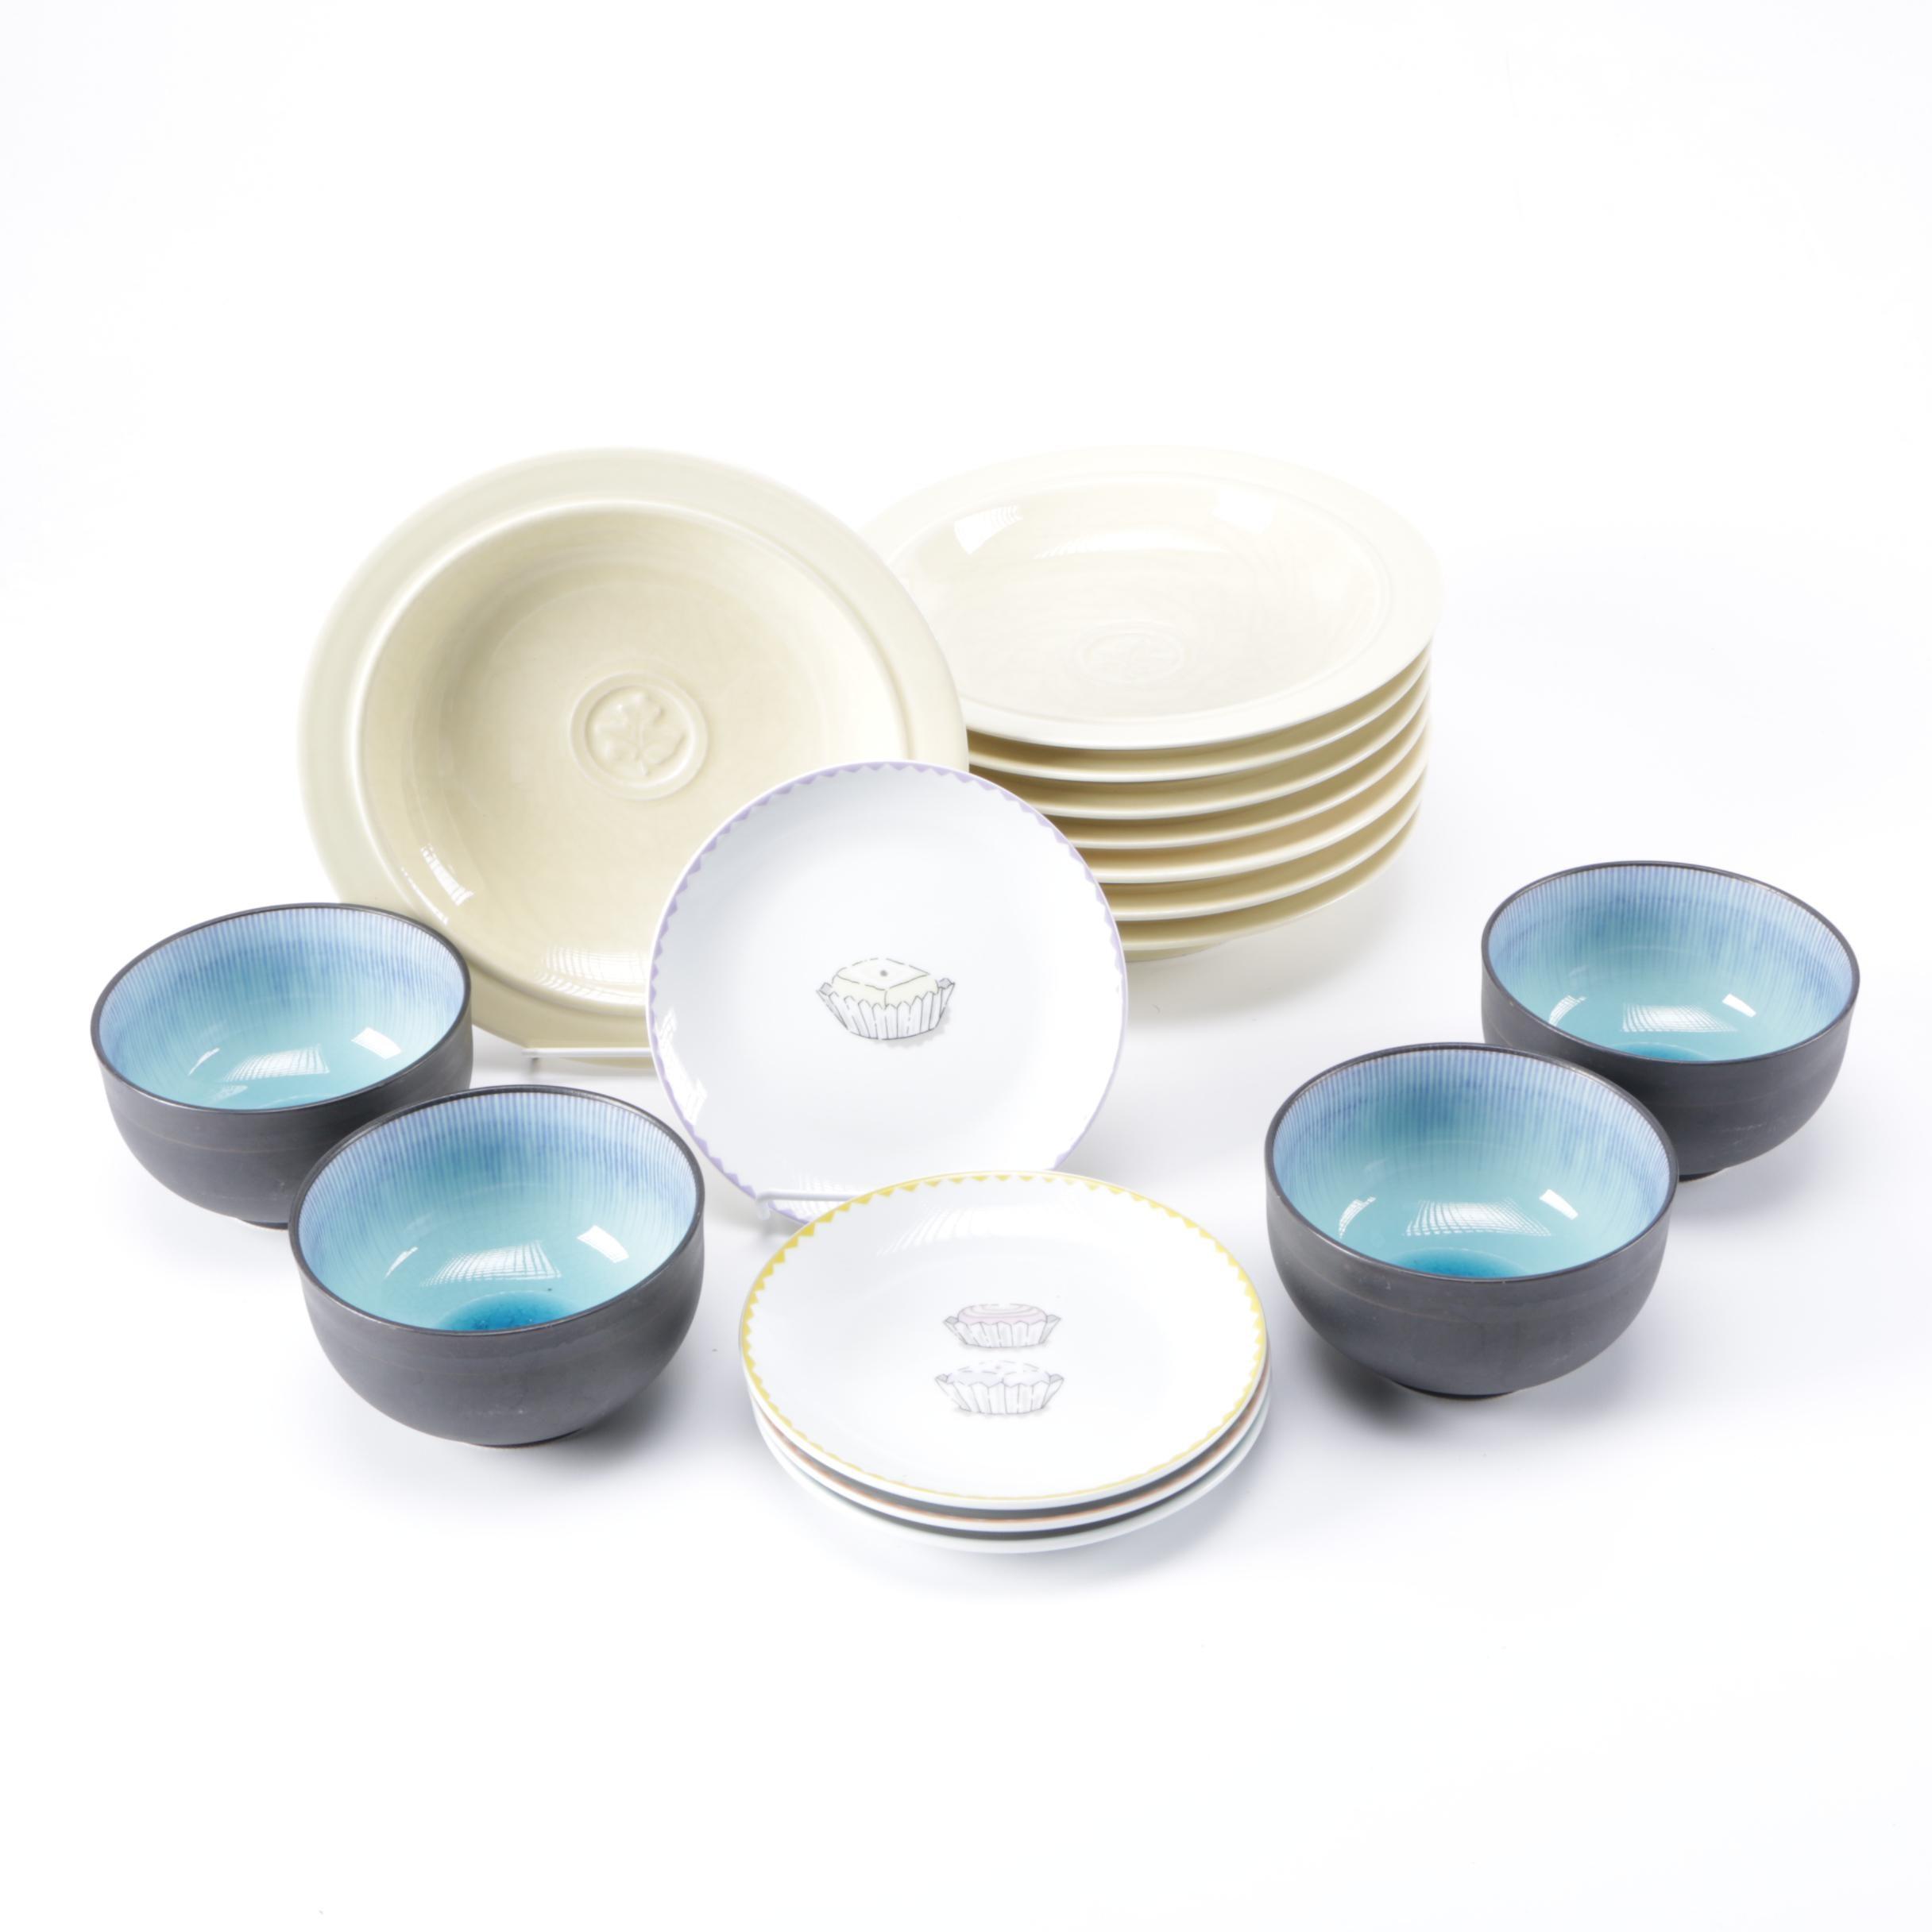 Selection of Ceramic Tableware Including Dansk Plates